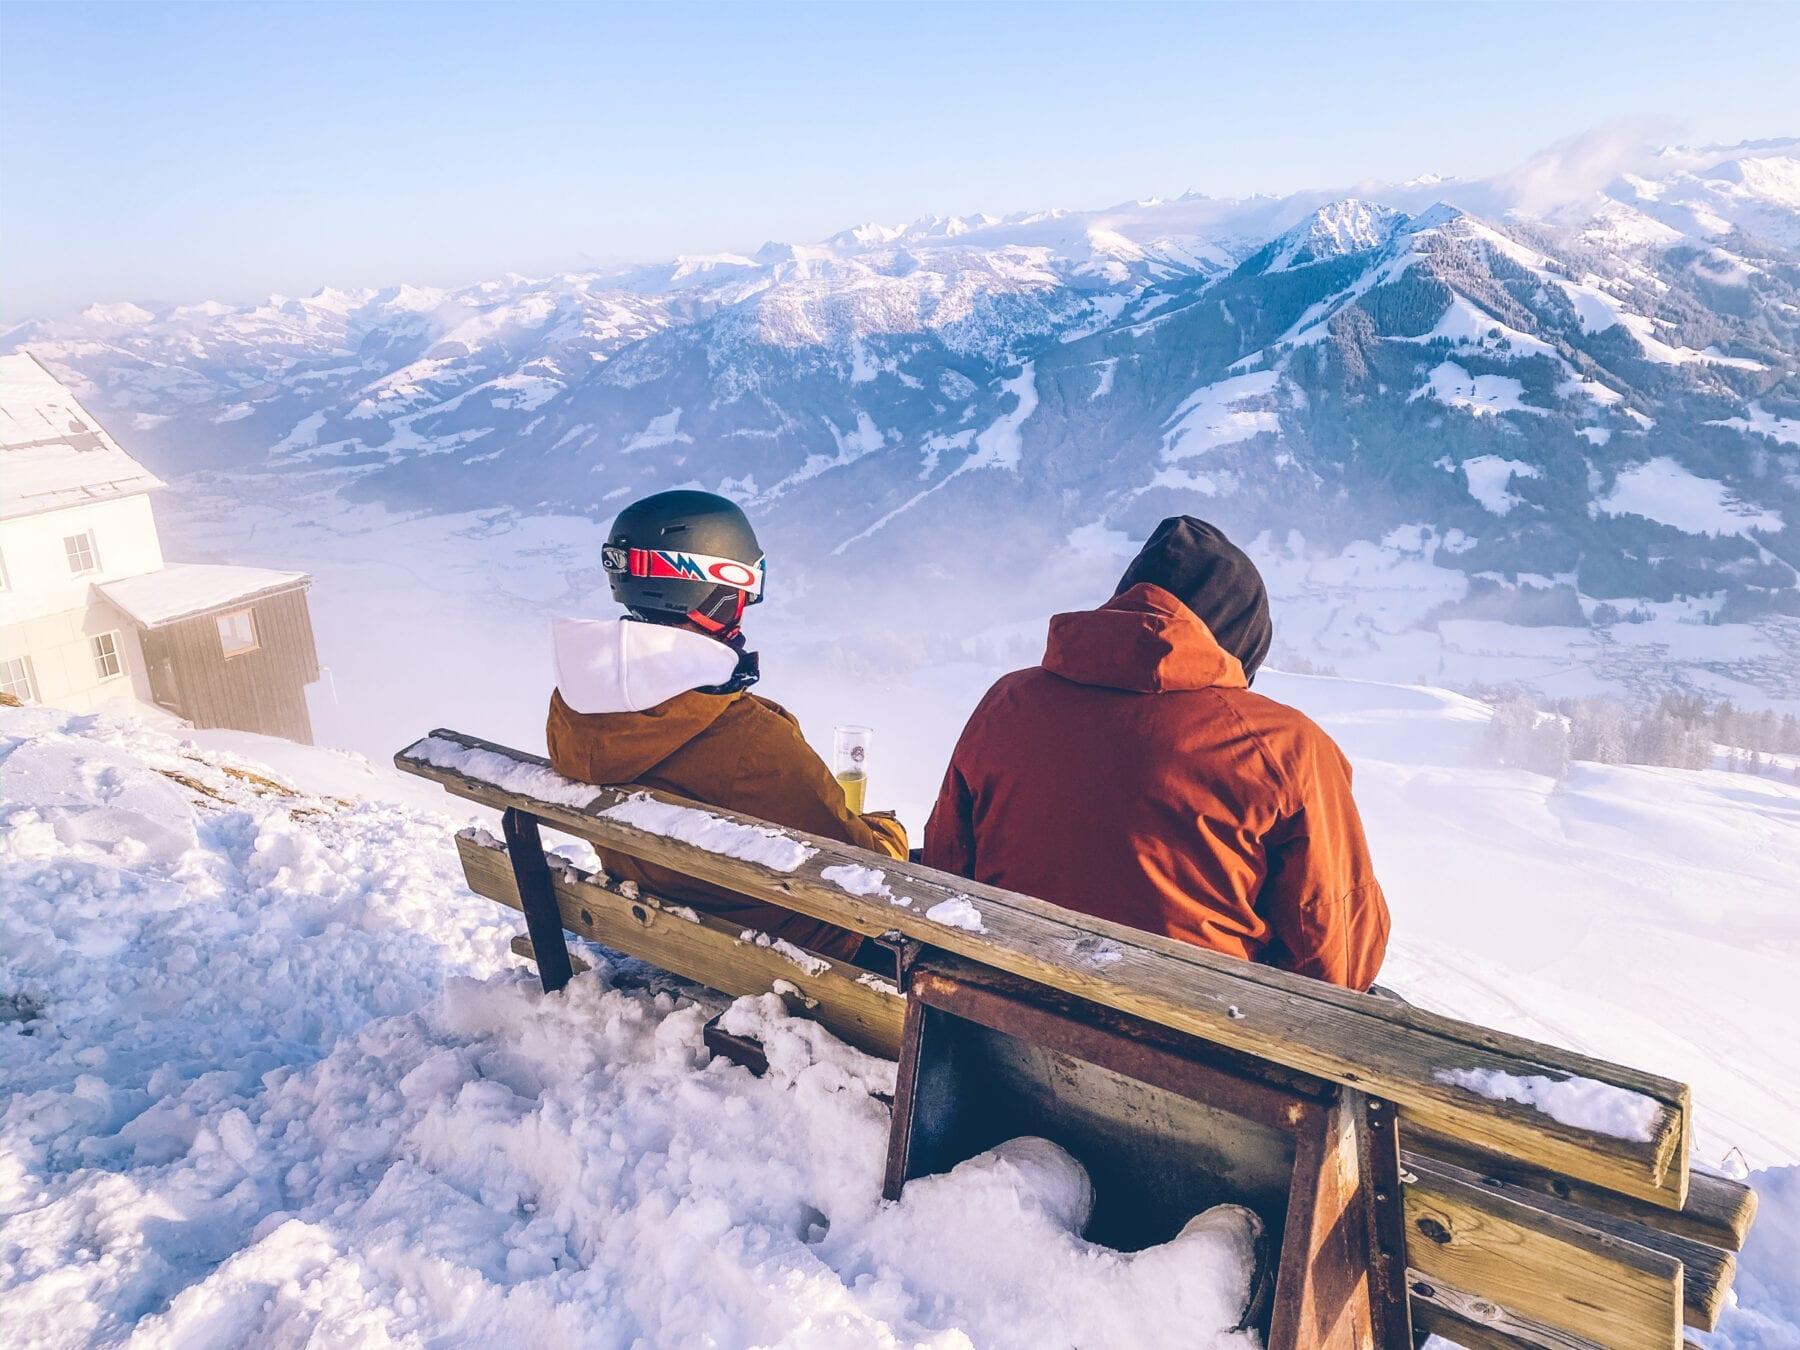 SkiWelt uitzichtpunt